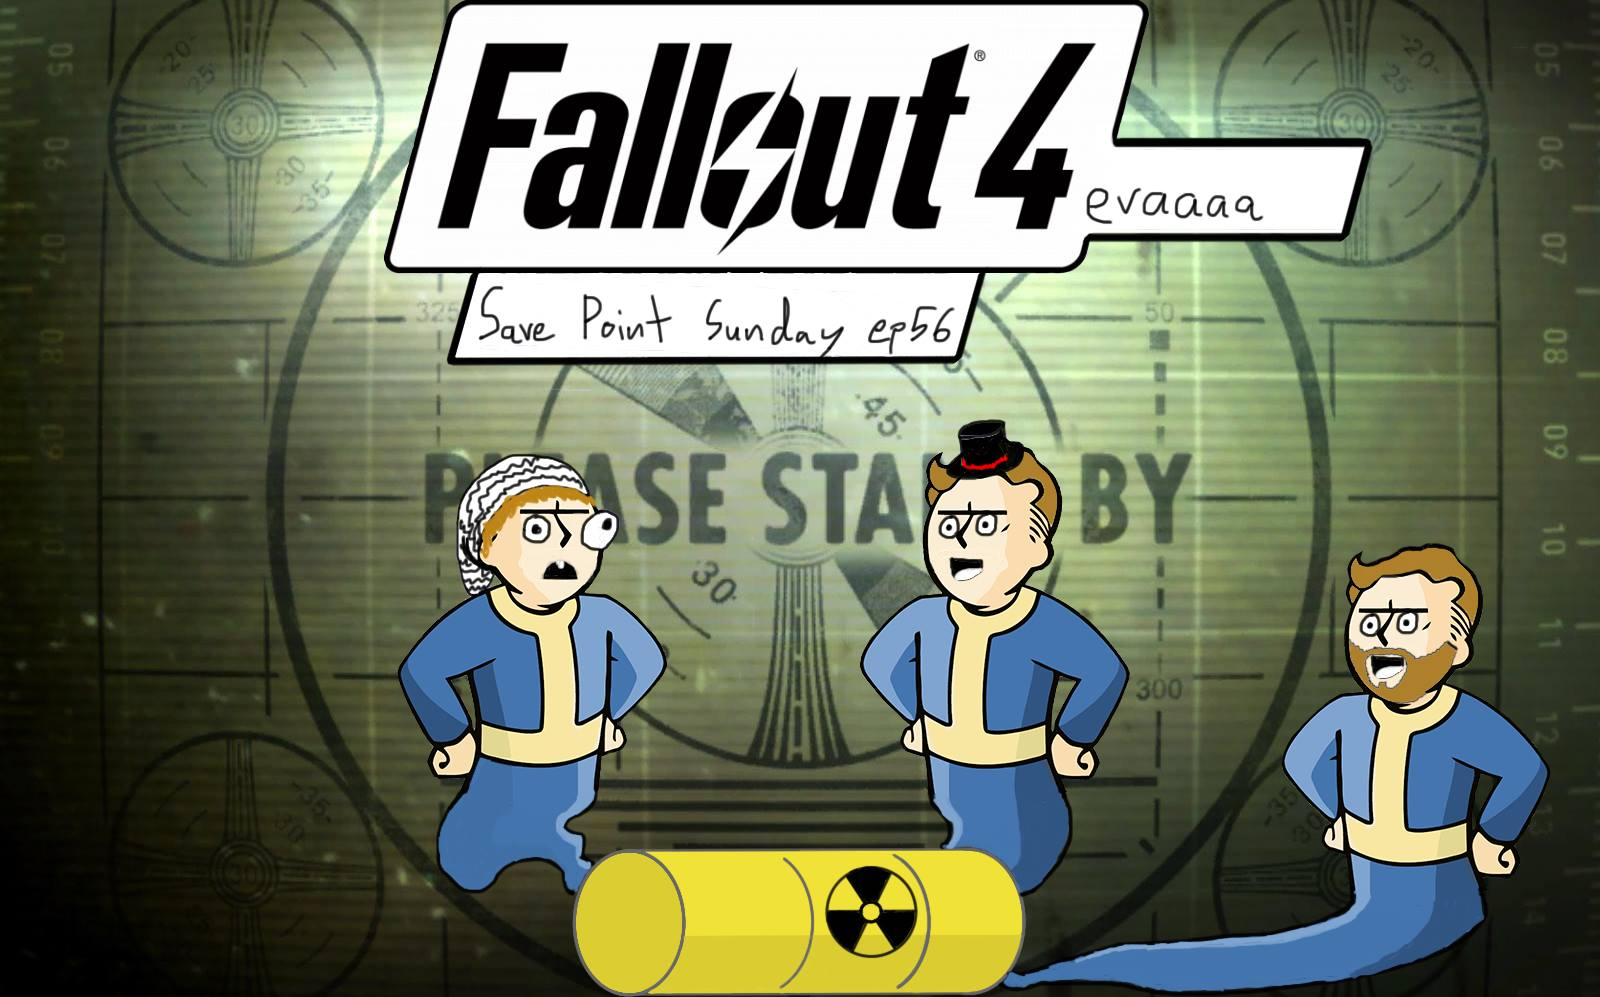 Episode 56: Fallout 4evaaaa